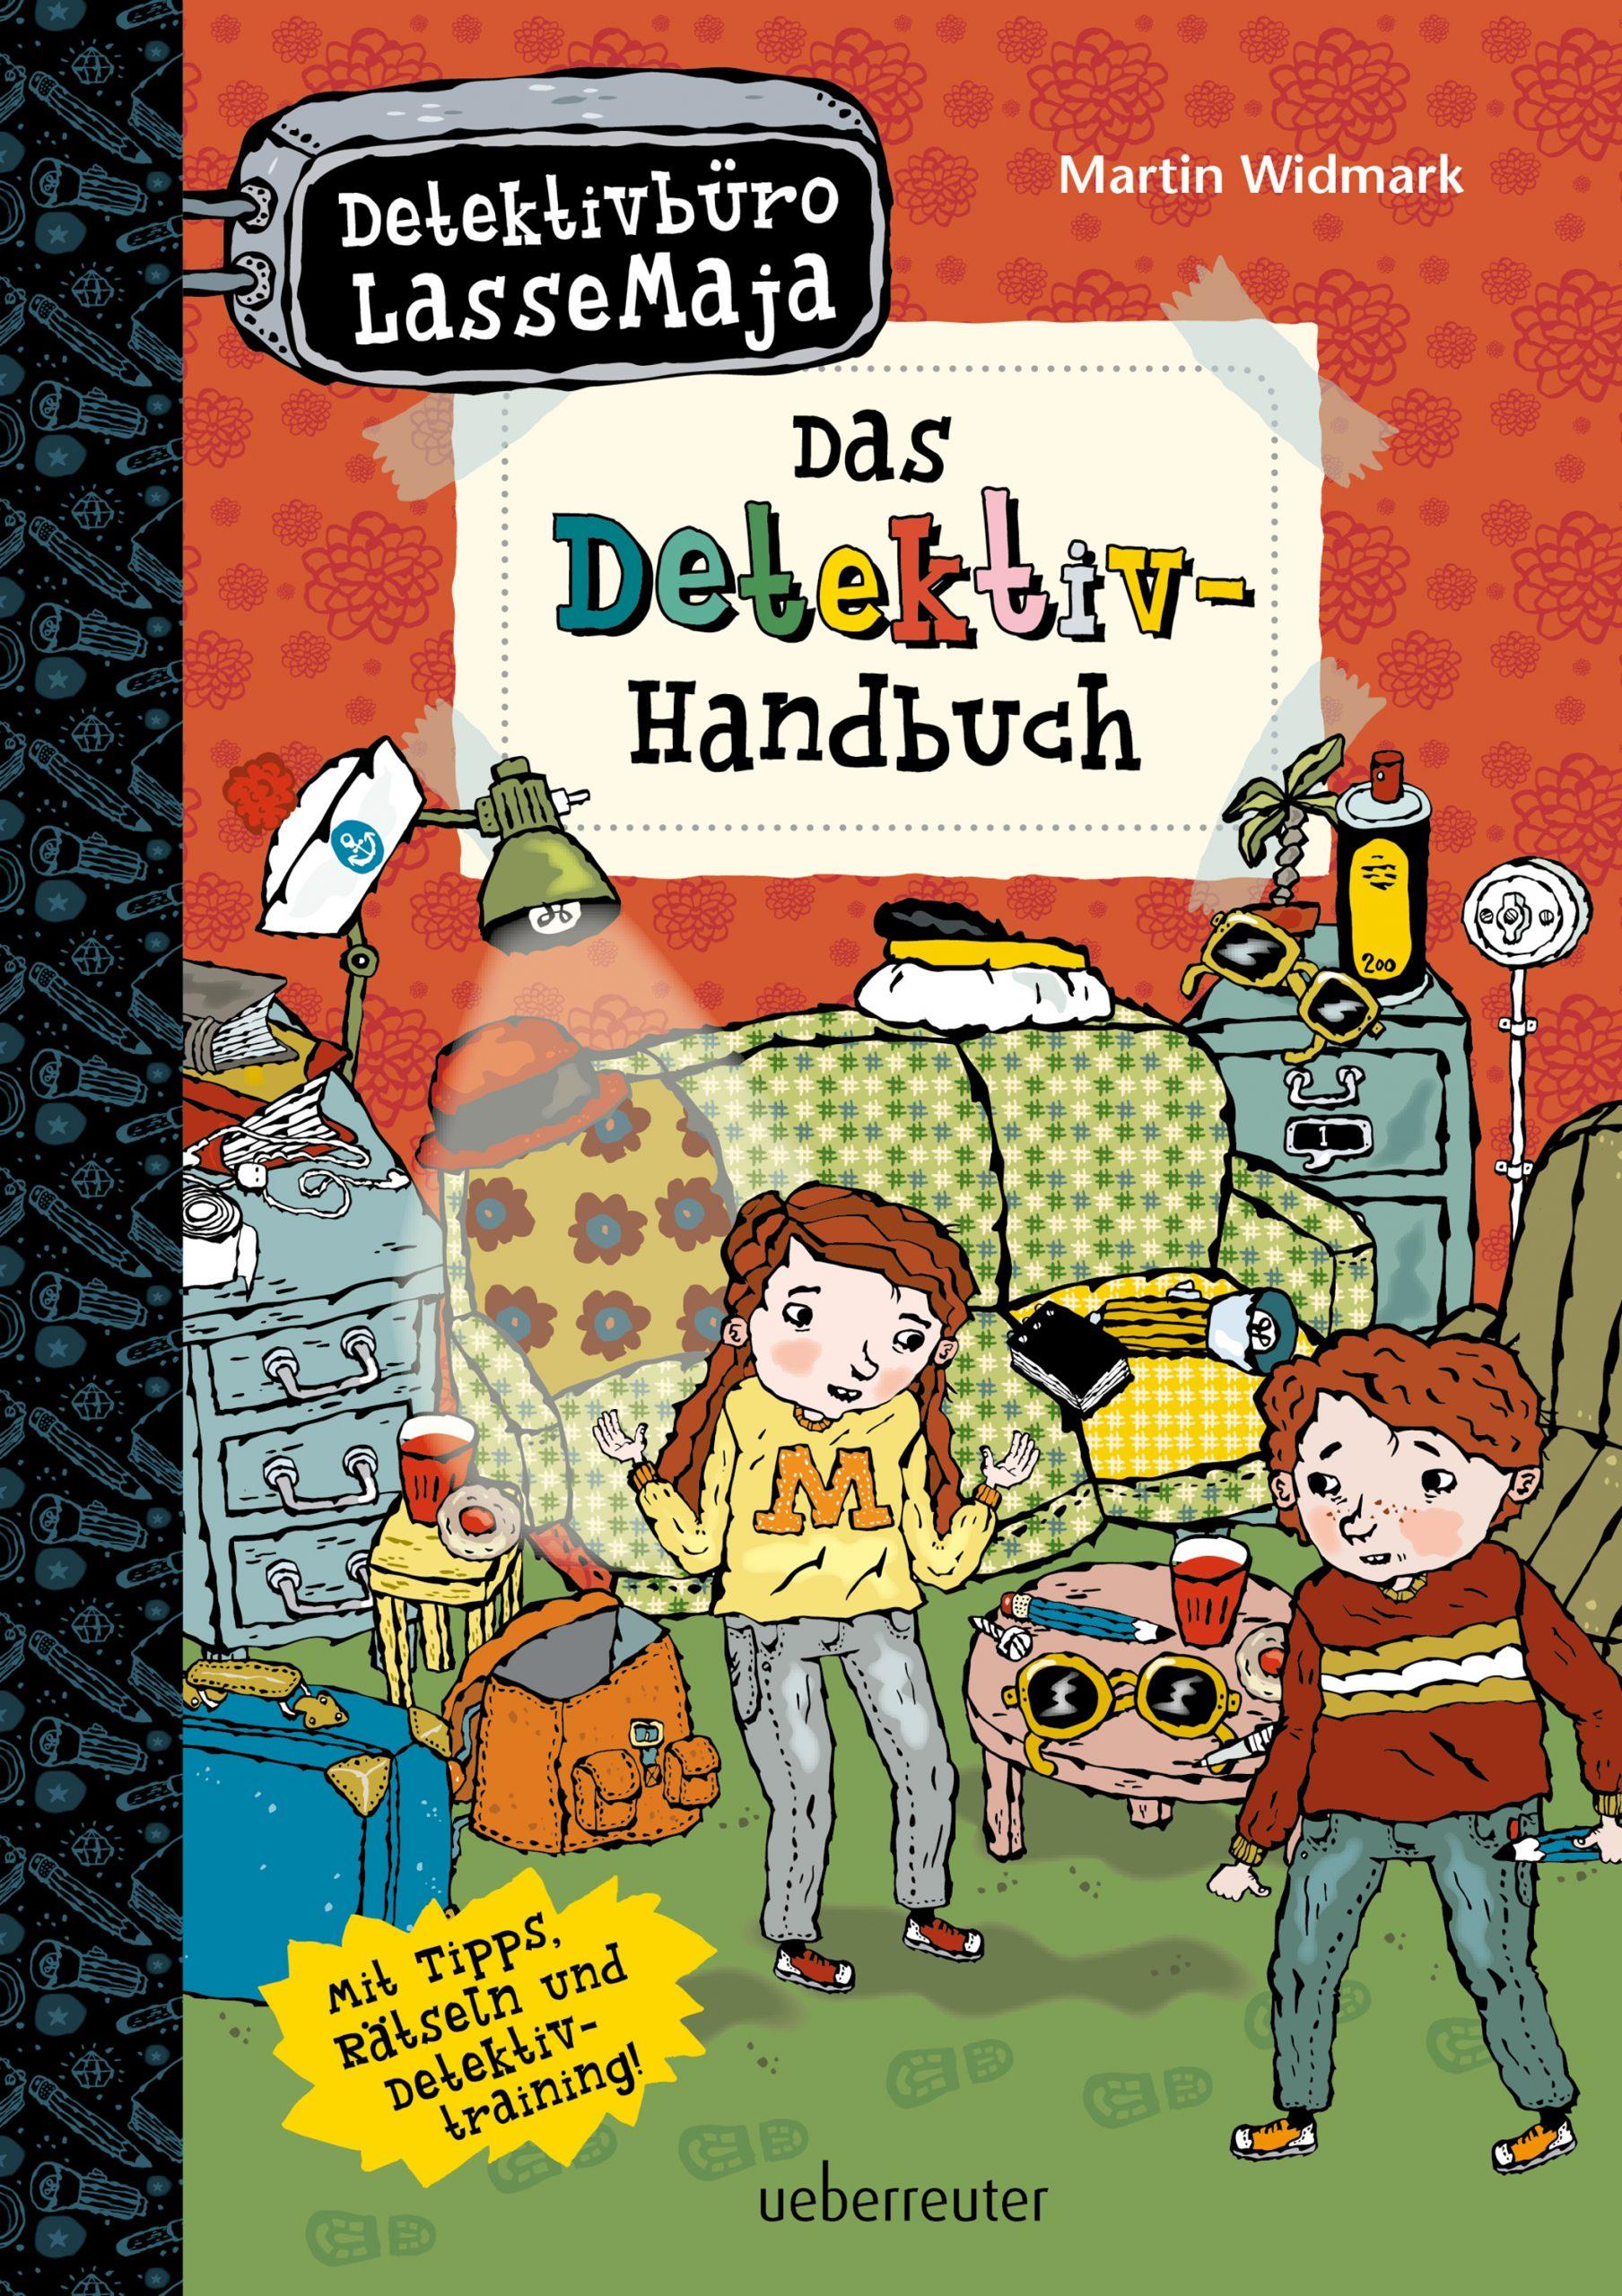 Detektivbüro LasseMaja – Das Detektiv-Handbuch (Detektivbüro LasseMaja, Bd. ?)